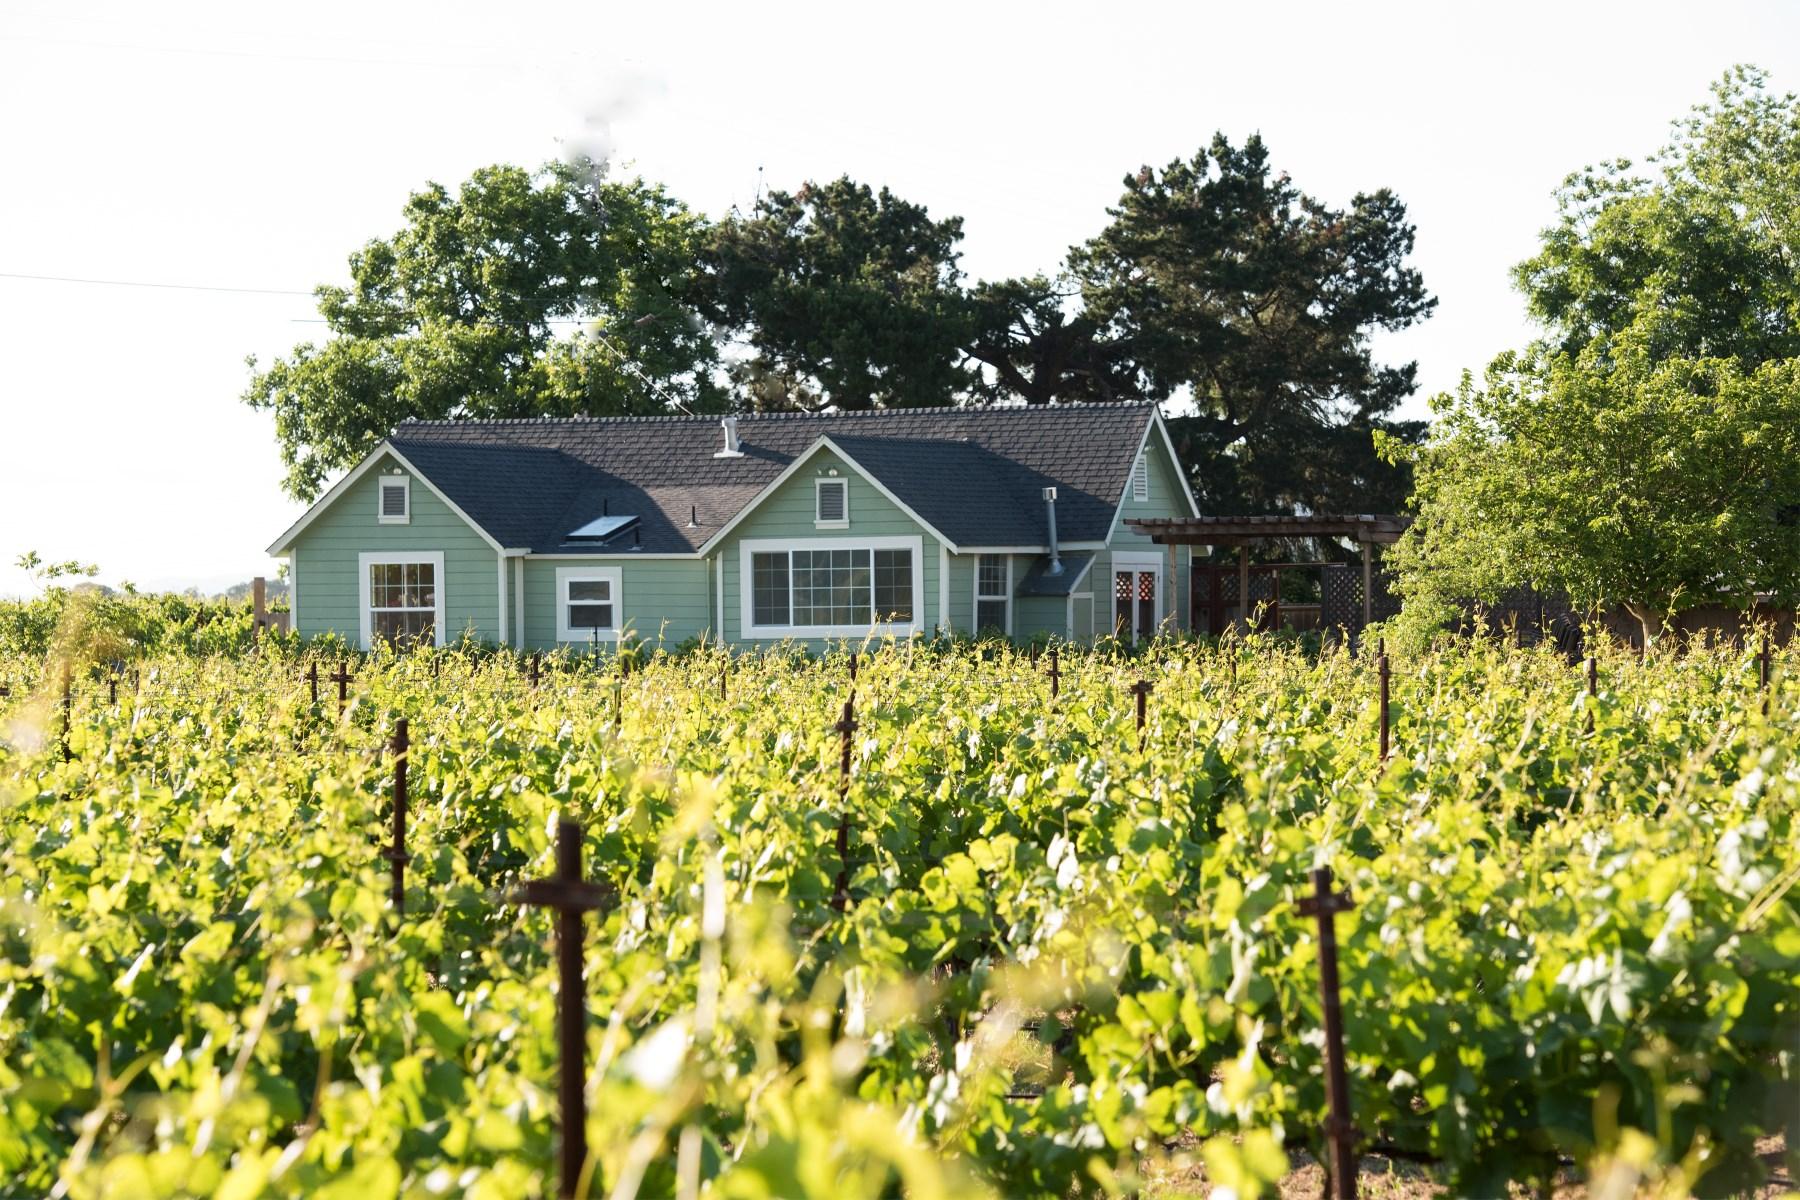 Vineyard for Sale at 23344 Burndale Road, Sonoma 23344 Burndale Rd Sonoma, California, 95476 United States